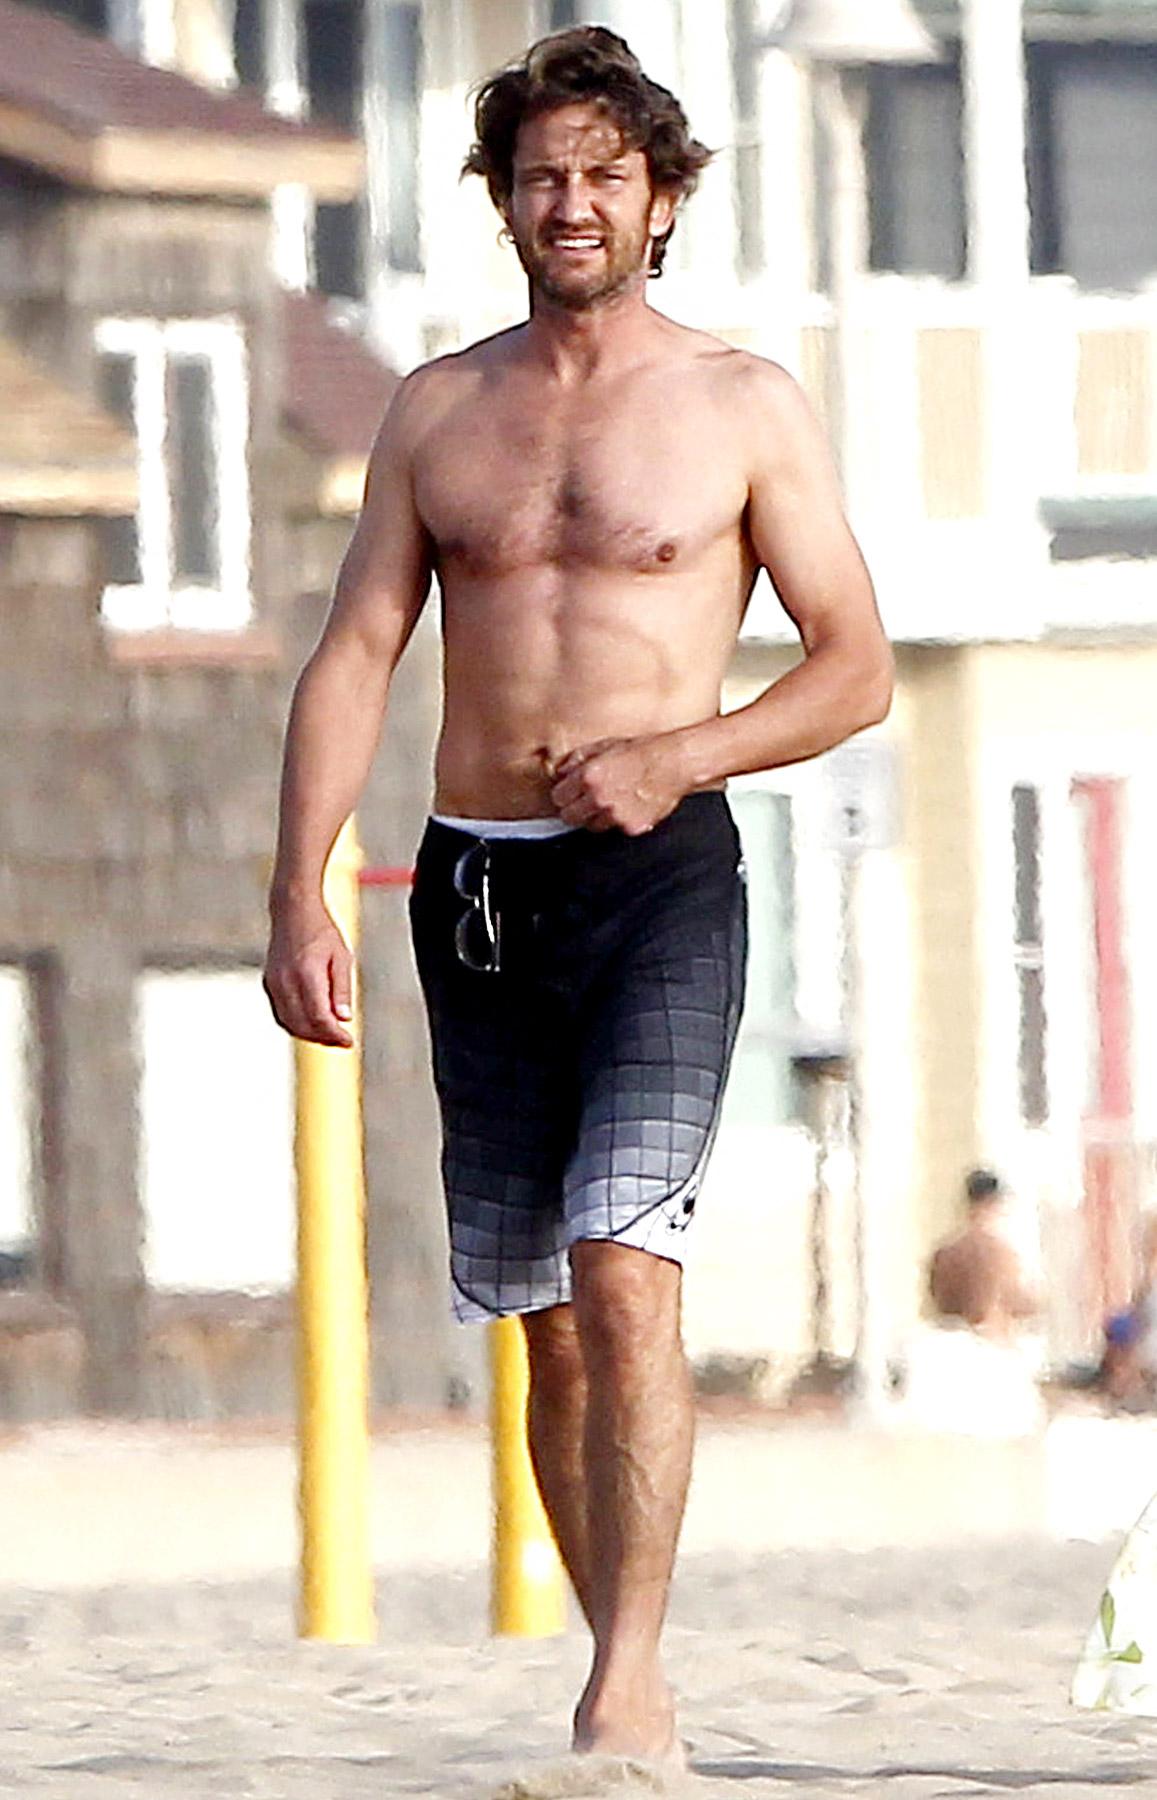 Healthy! gerard butler shirtless interesting